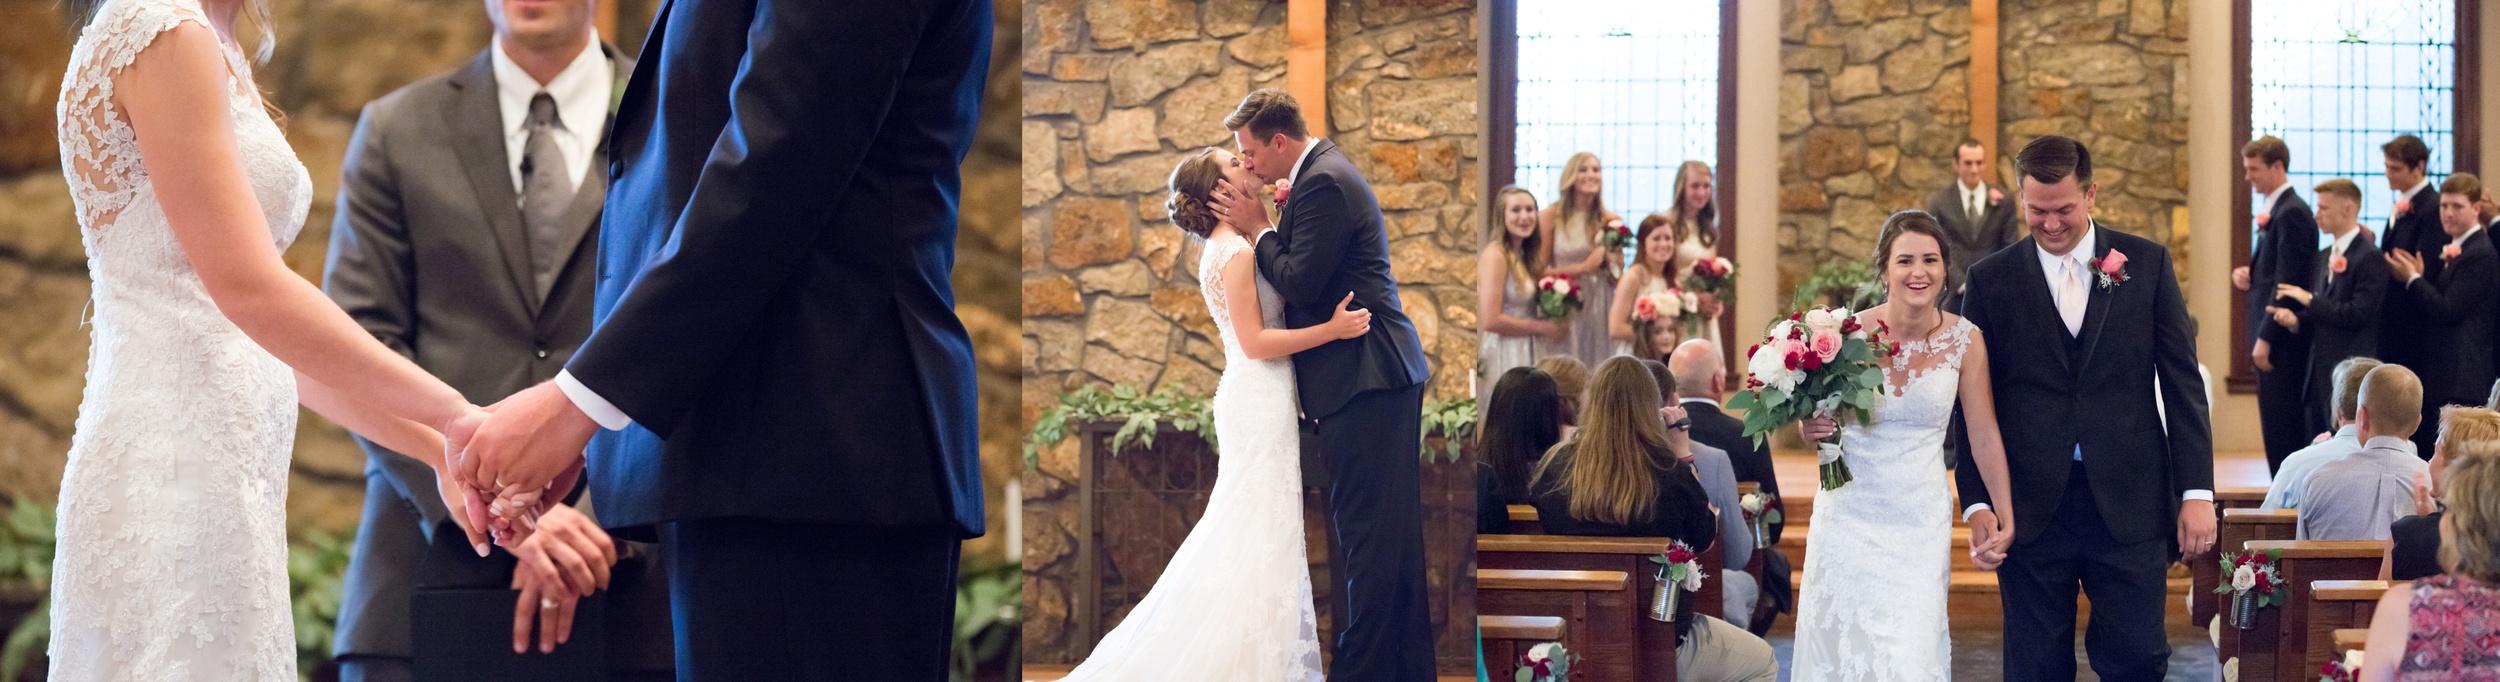 Wedding Ceremony, Stone Chapel at Matt Lane Farms